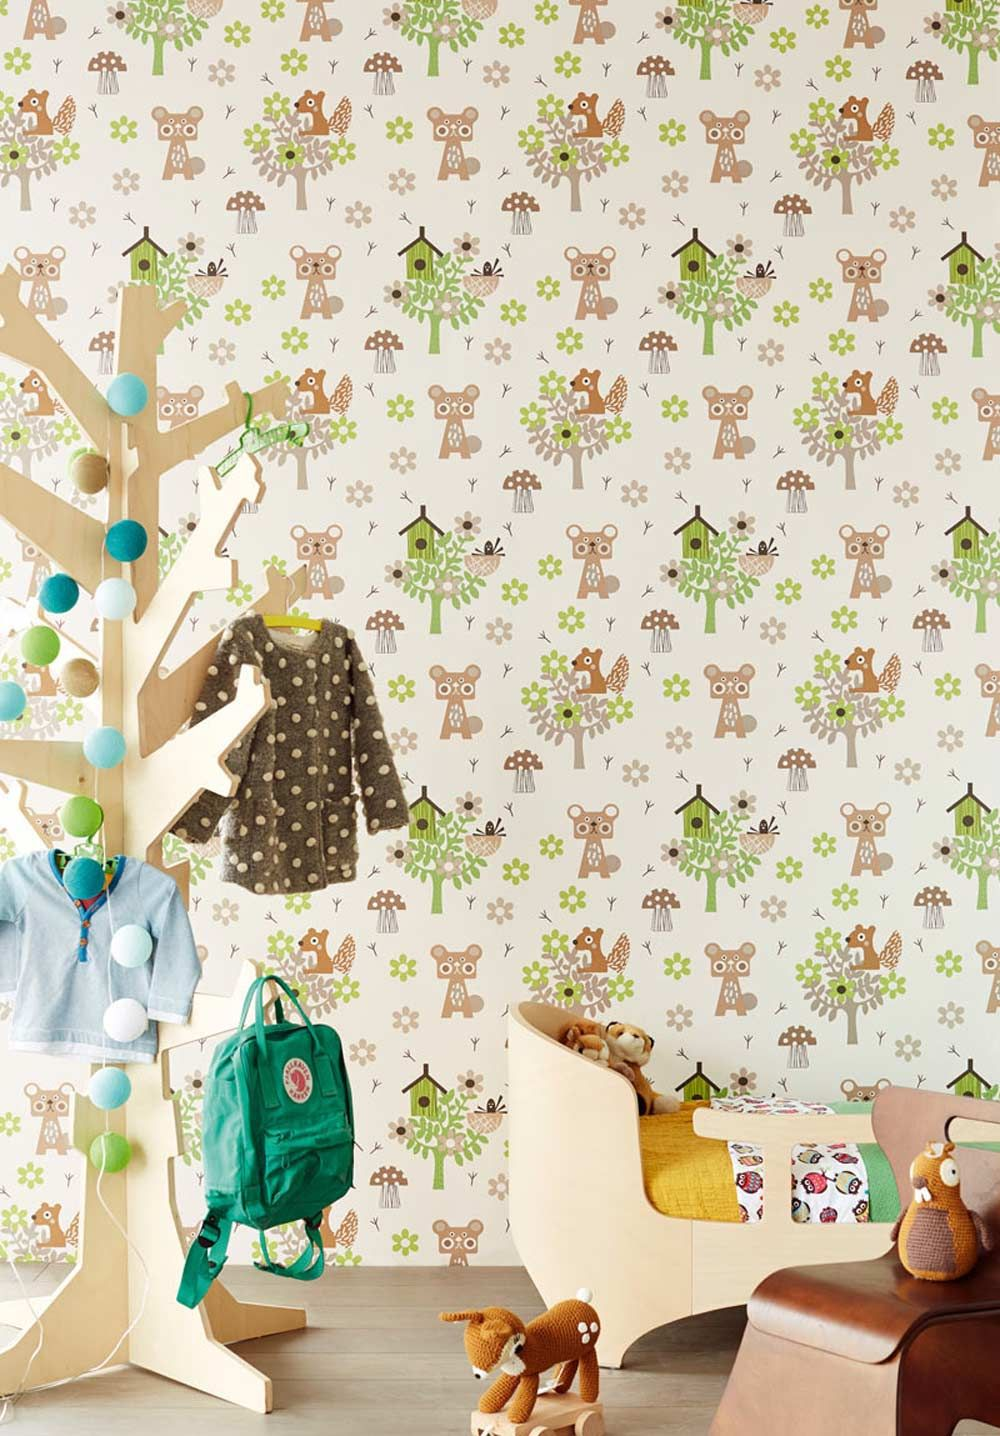 tapete babyzimmer beautiful designer tapeten im abbildung. Black Bedroom Furniture Sets. Home Design Ideas